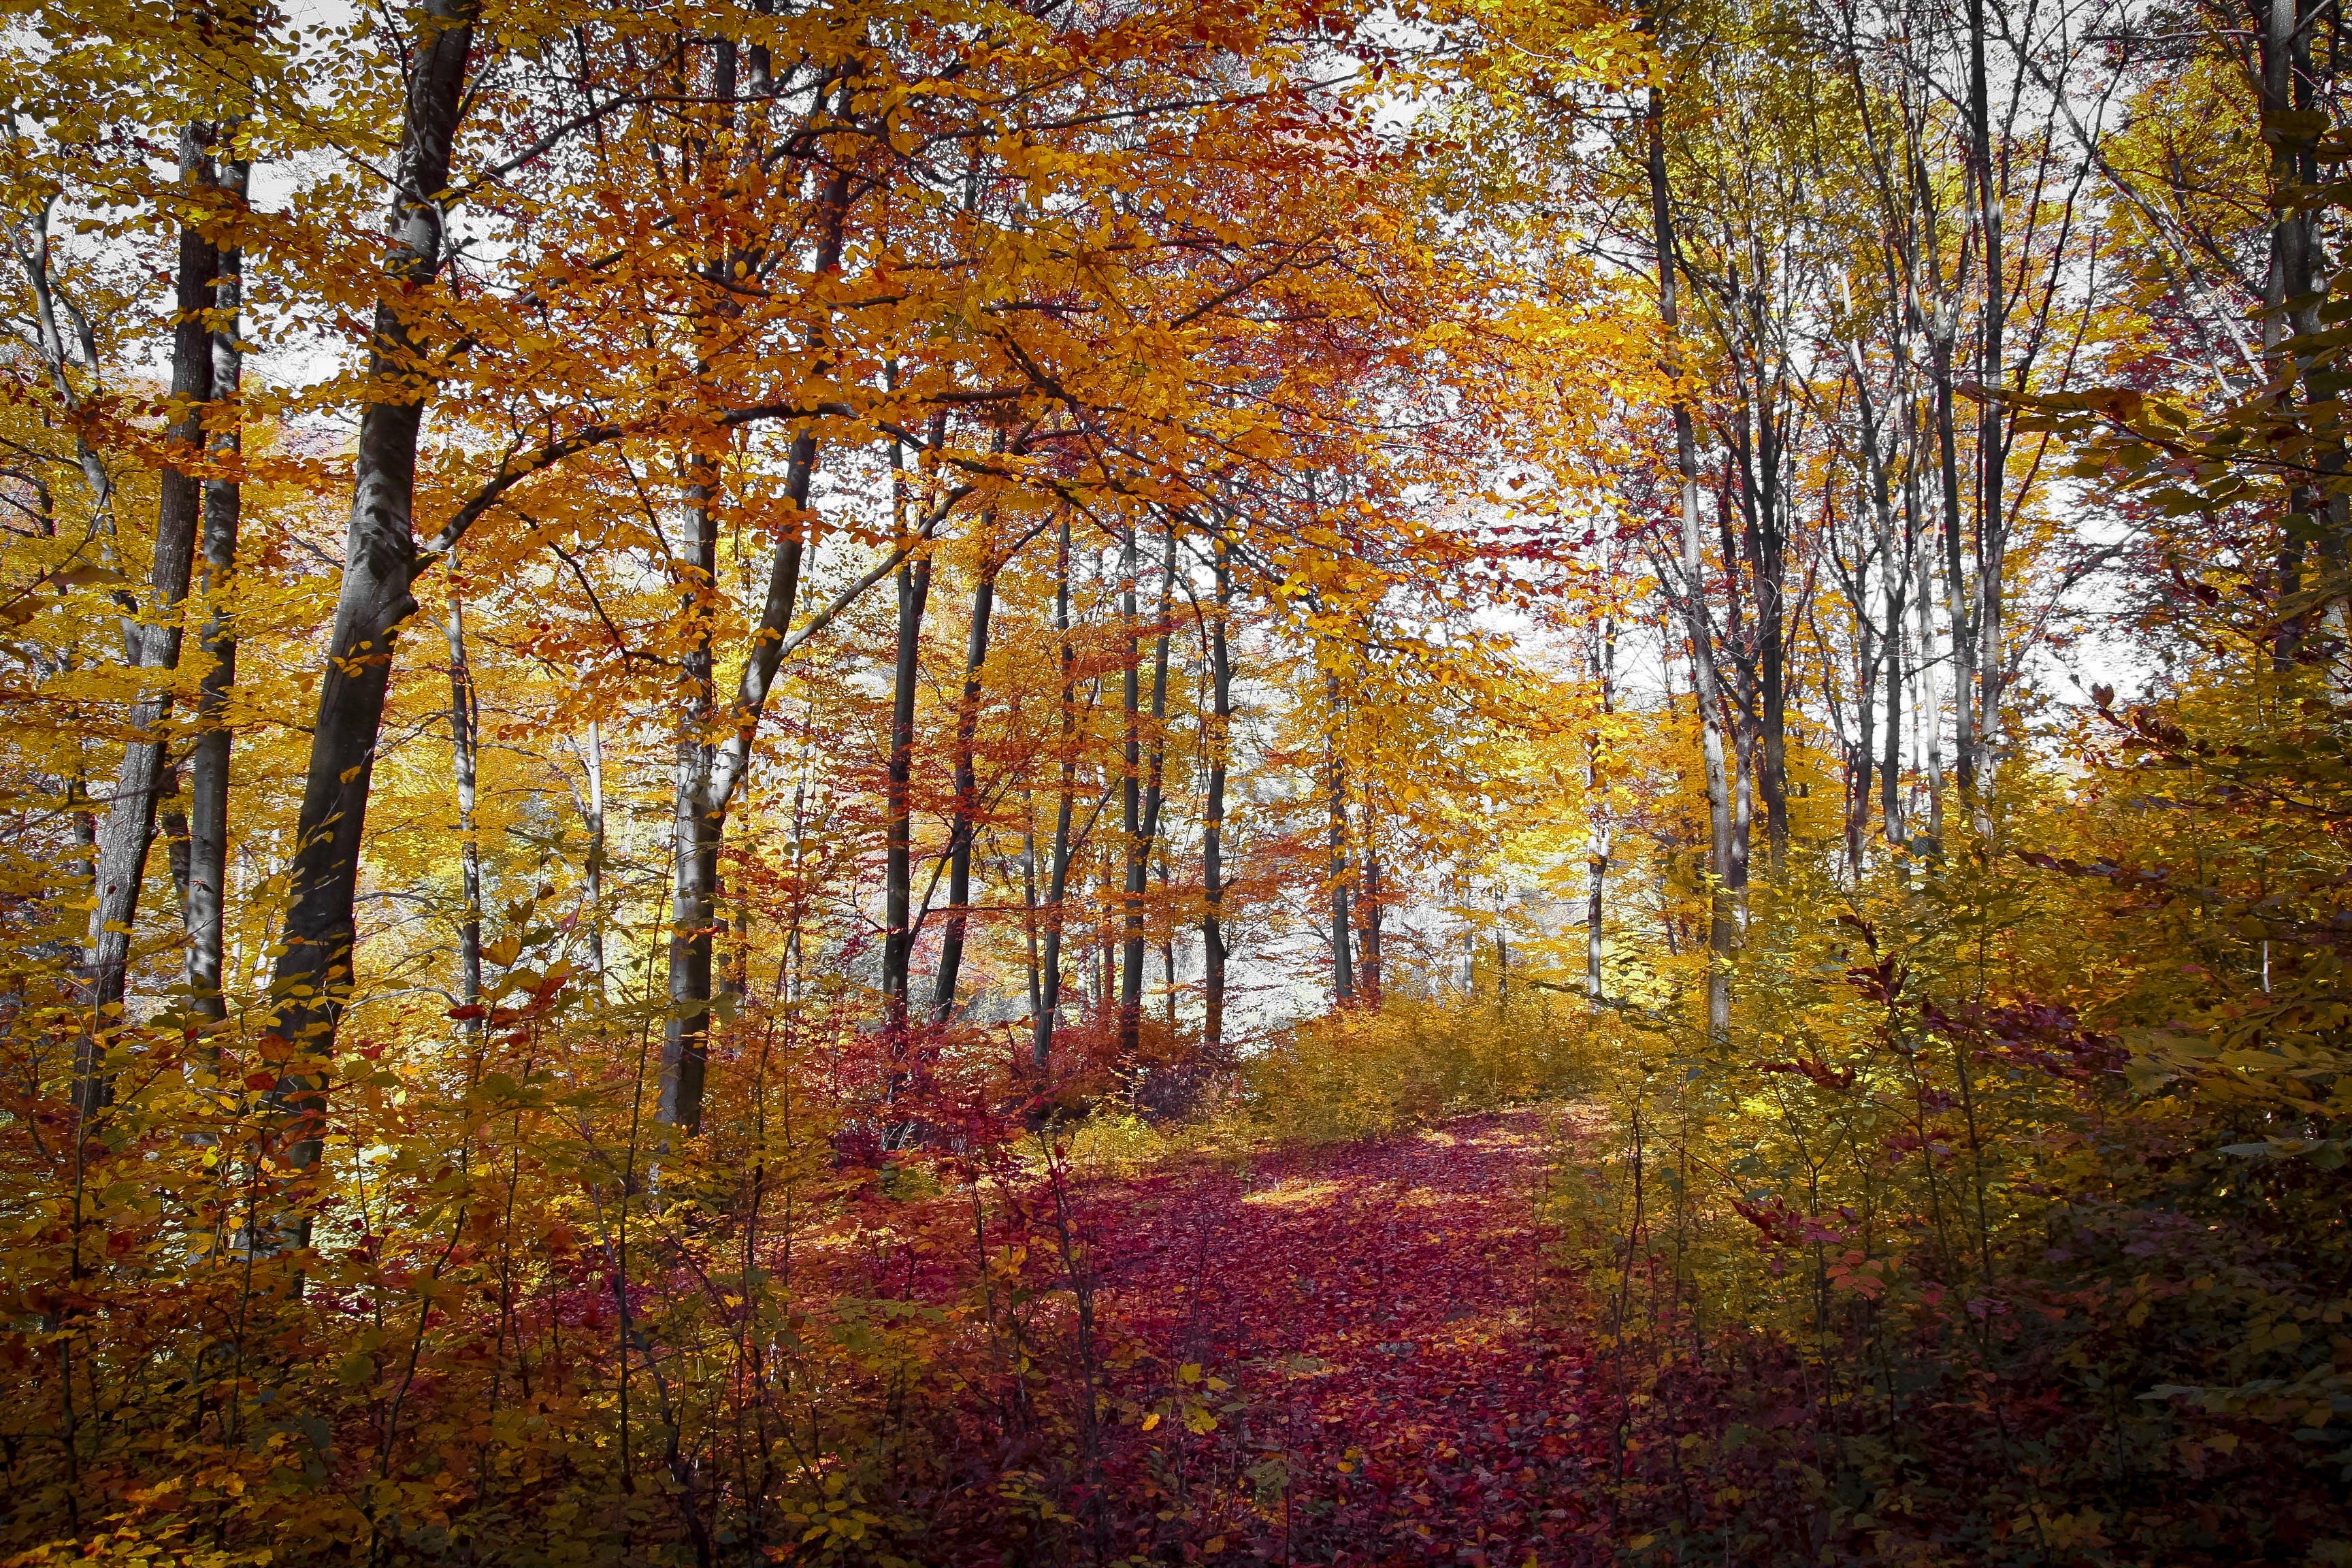 Forest Digital Wallpaper